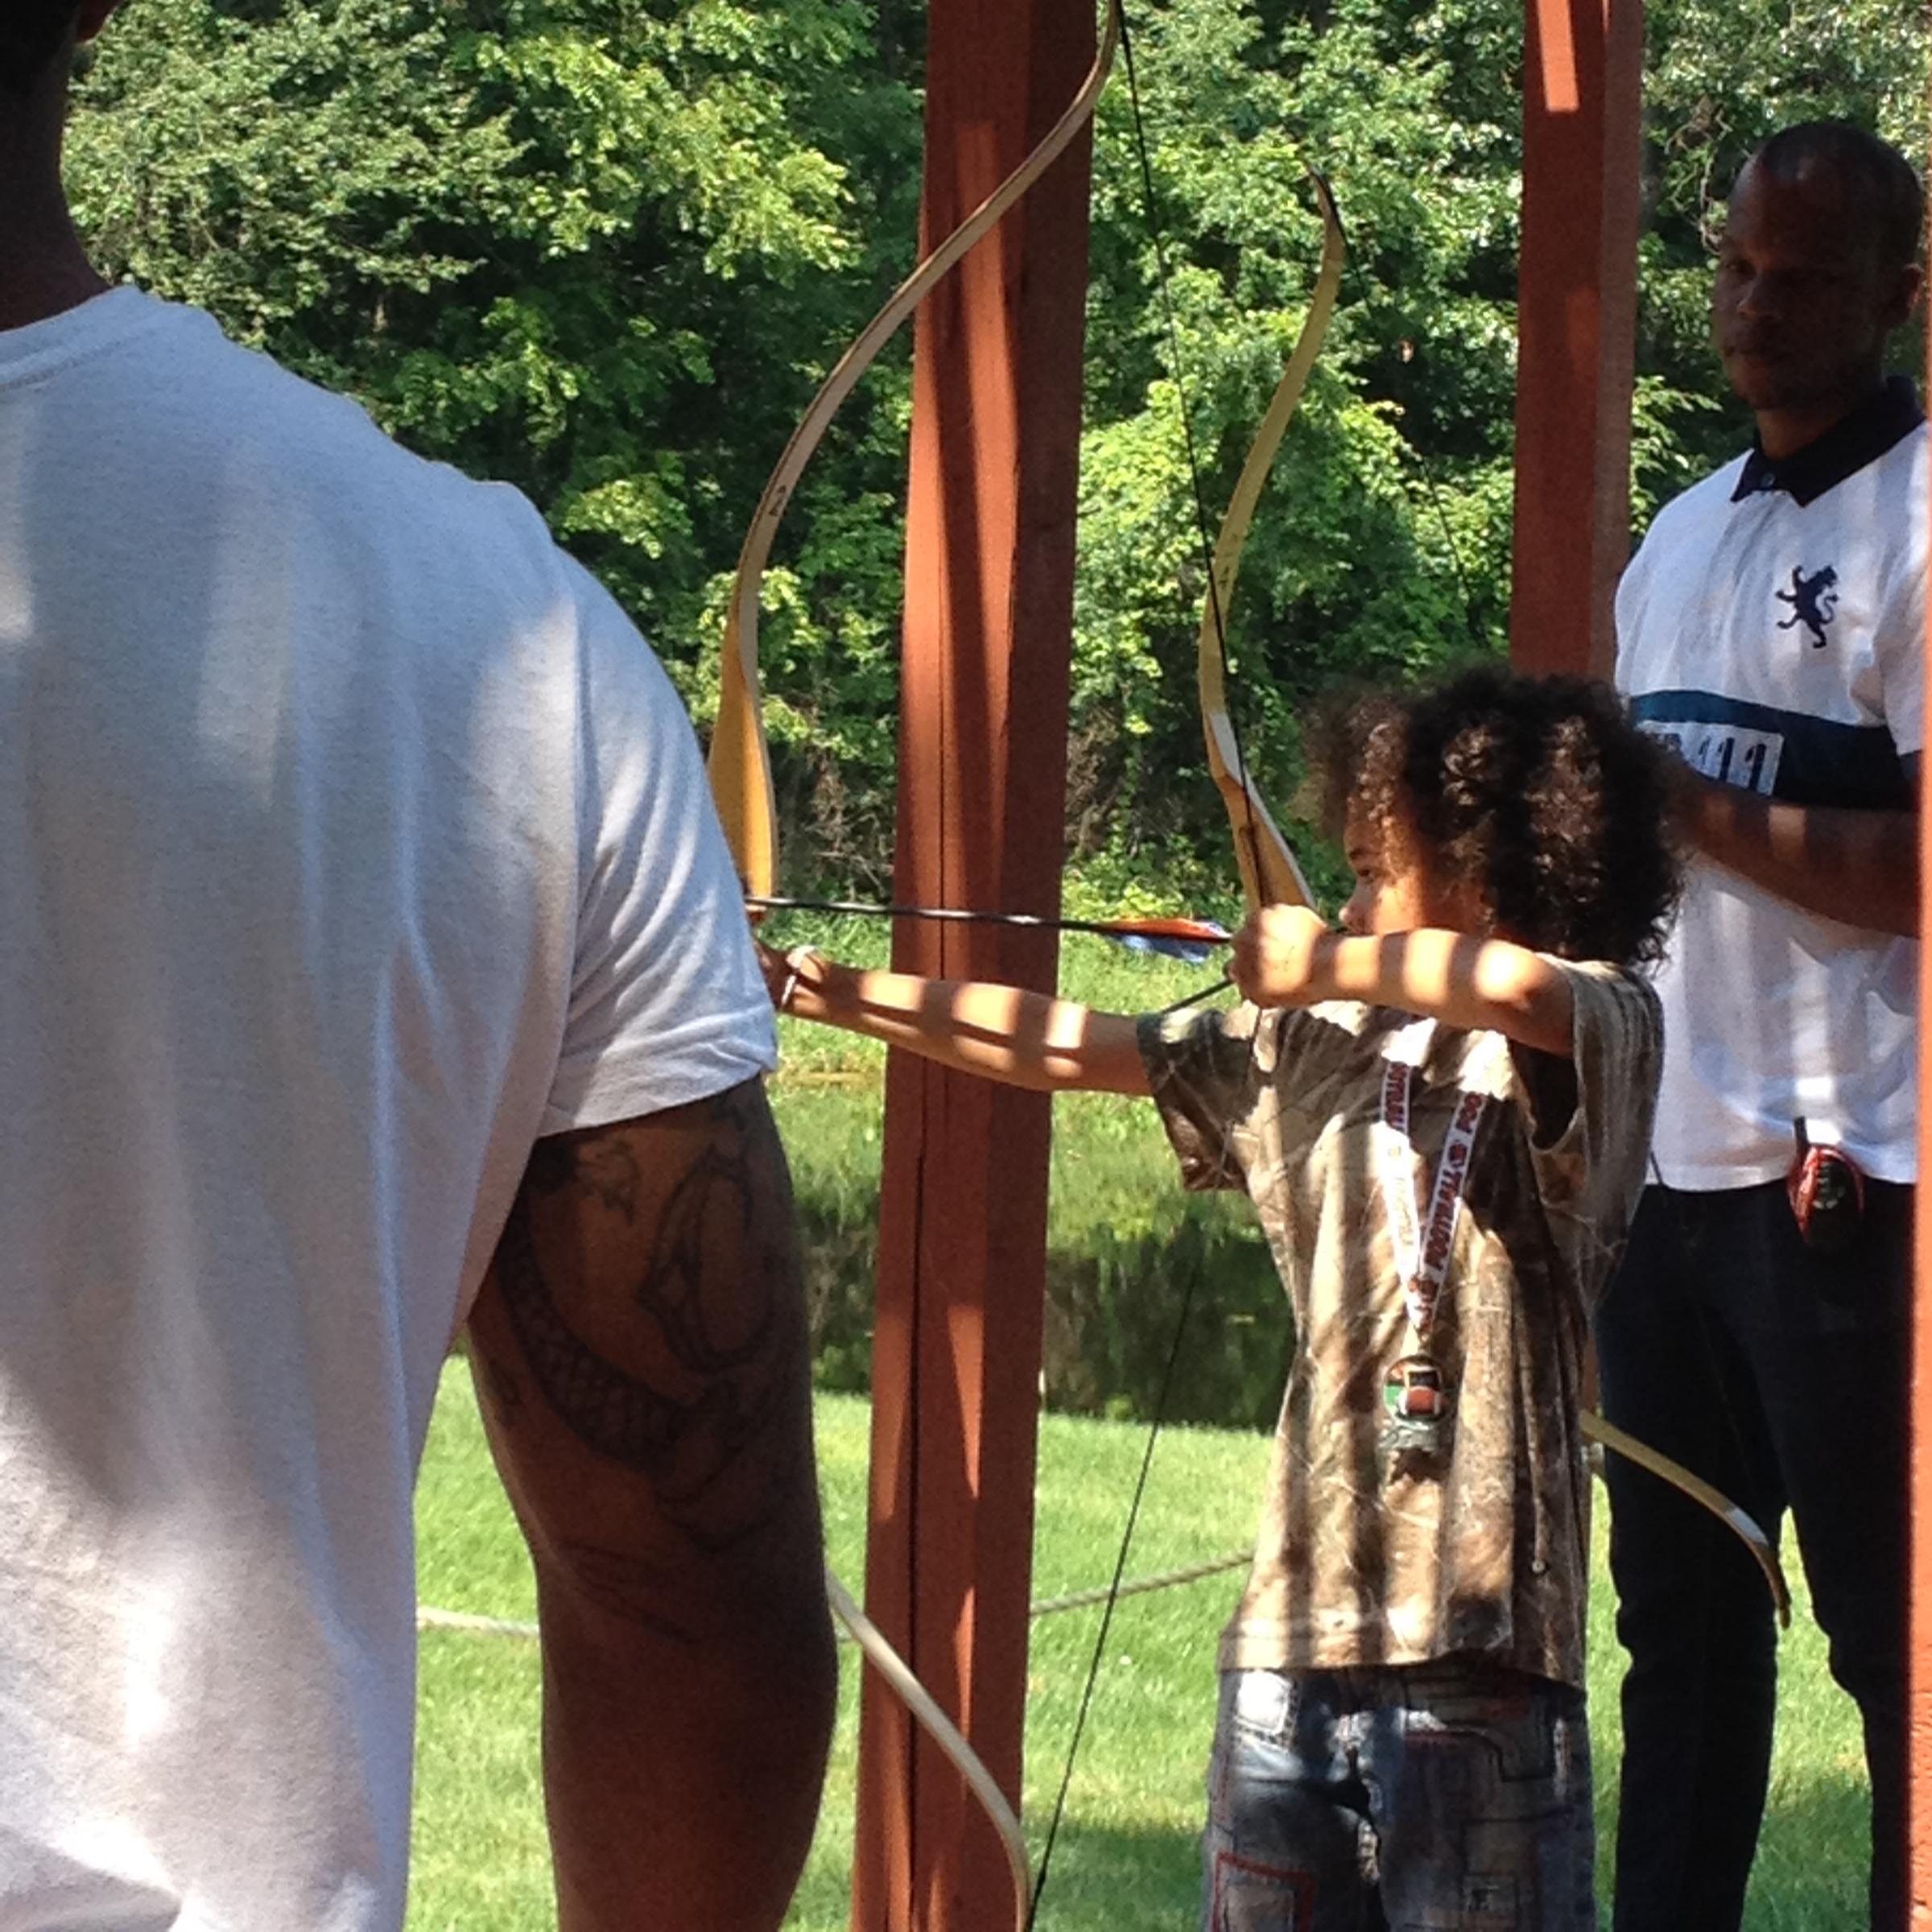 Caption: Detroit students get to practice archery at Camp Burt Shurly., Credit: JENNIFER GUERRA / MICHIGAN RADIO